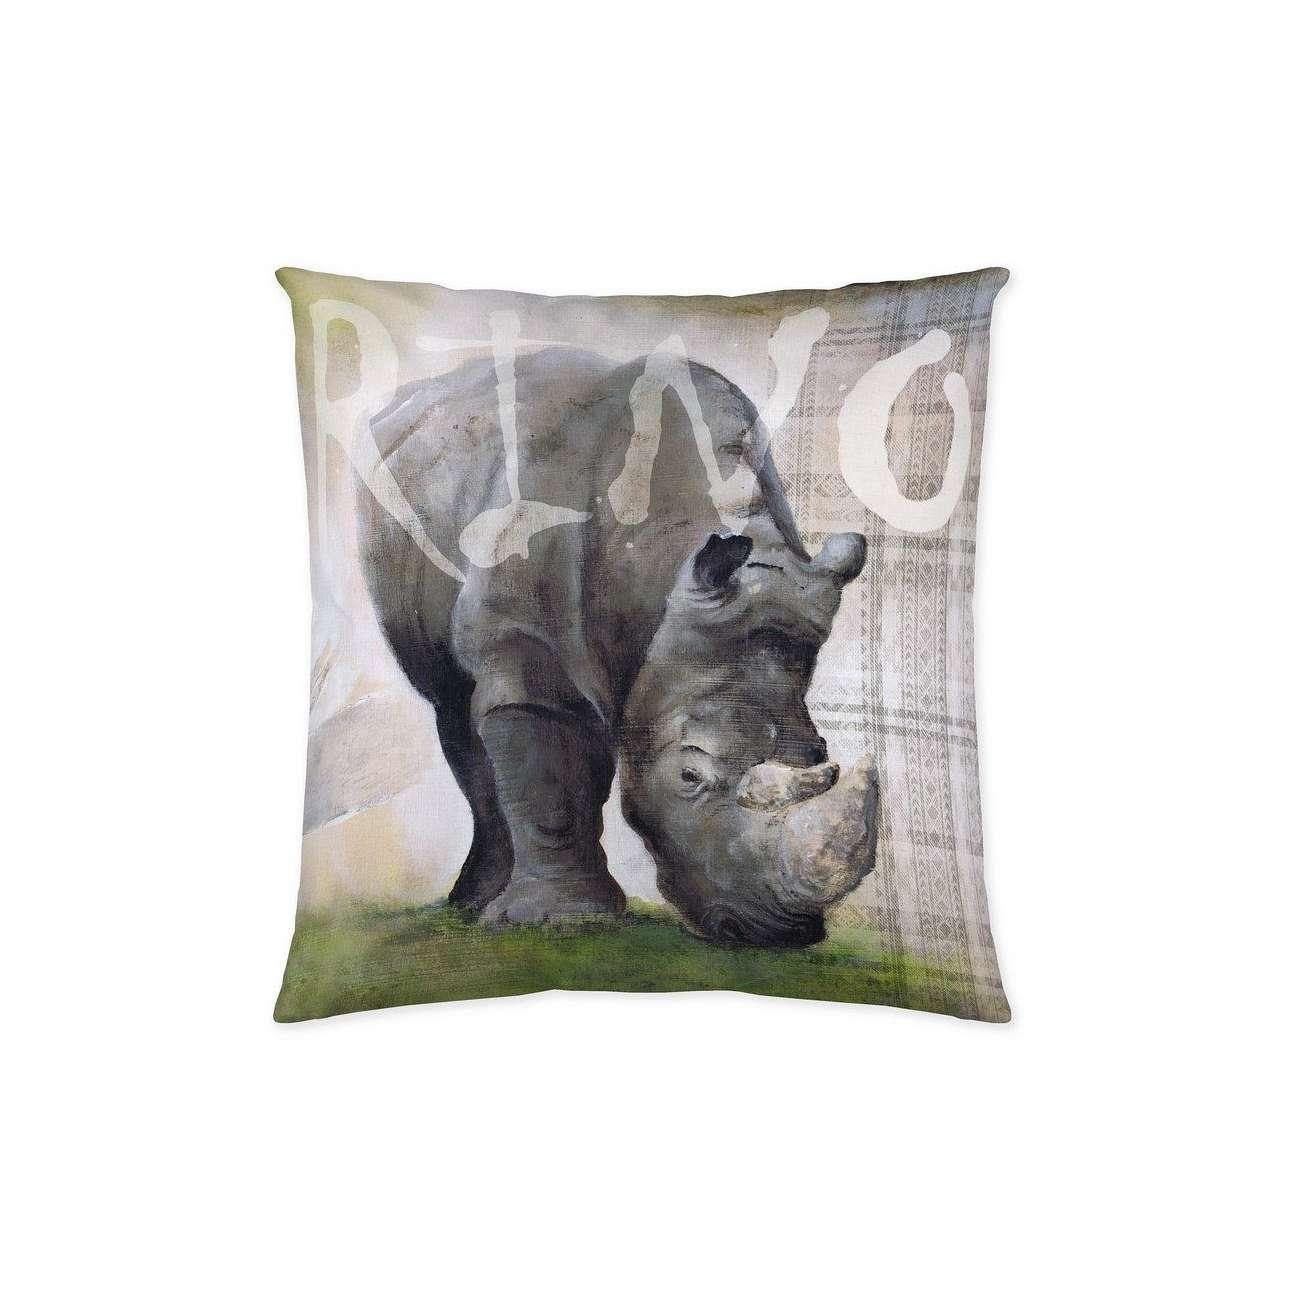 Potah Rhinoceros 45x45cm